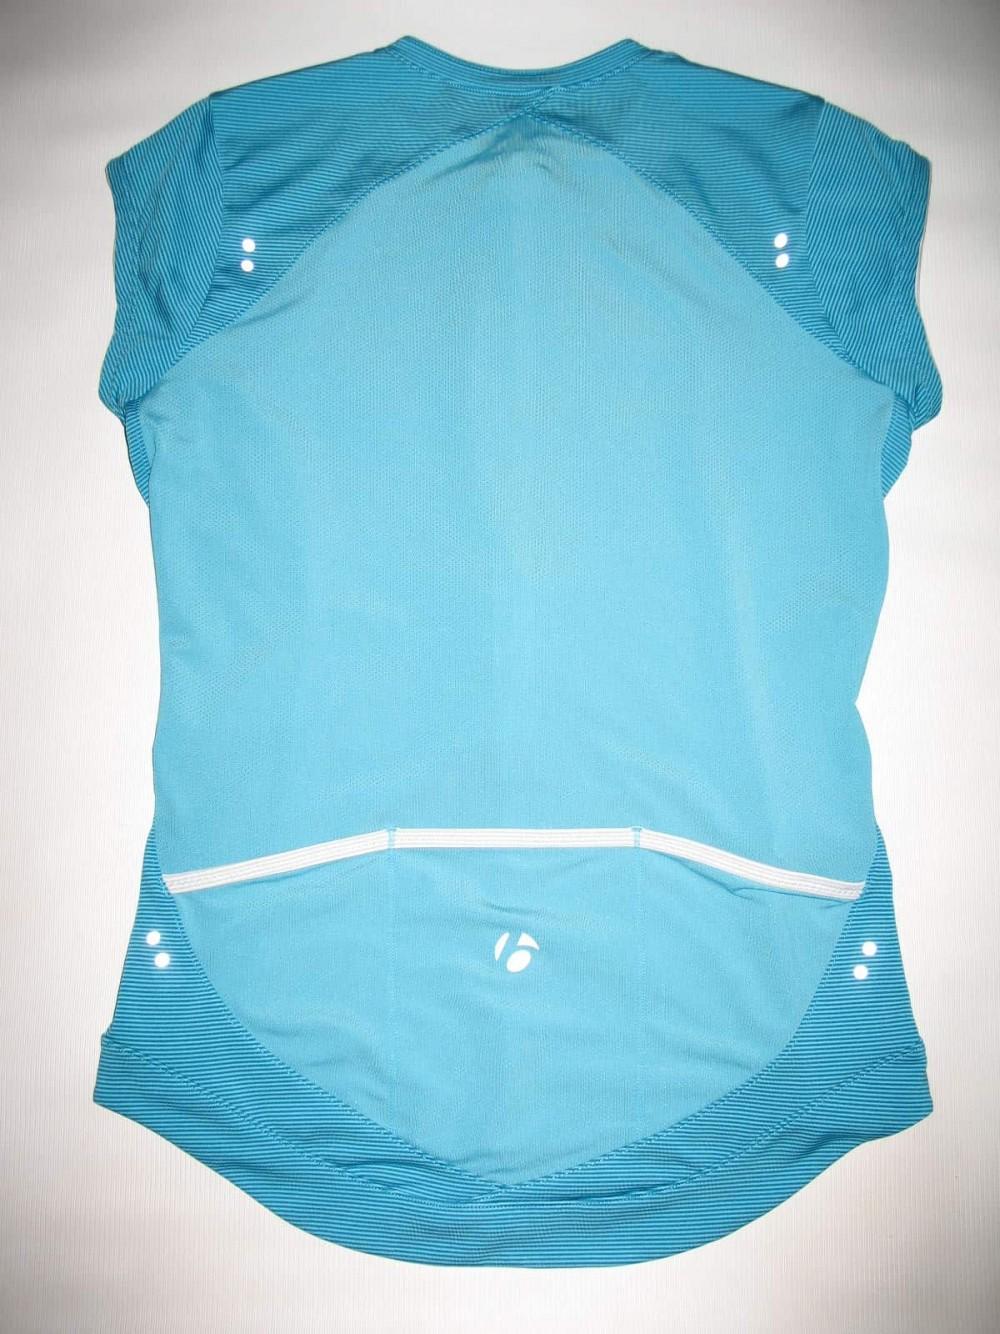 Веломайка BONTRAGER vella cycling jersey lady (размер M) - 1